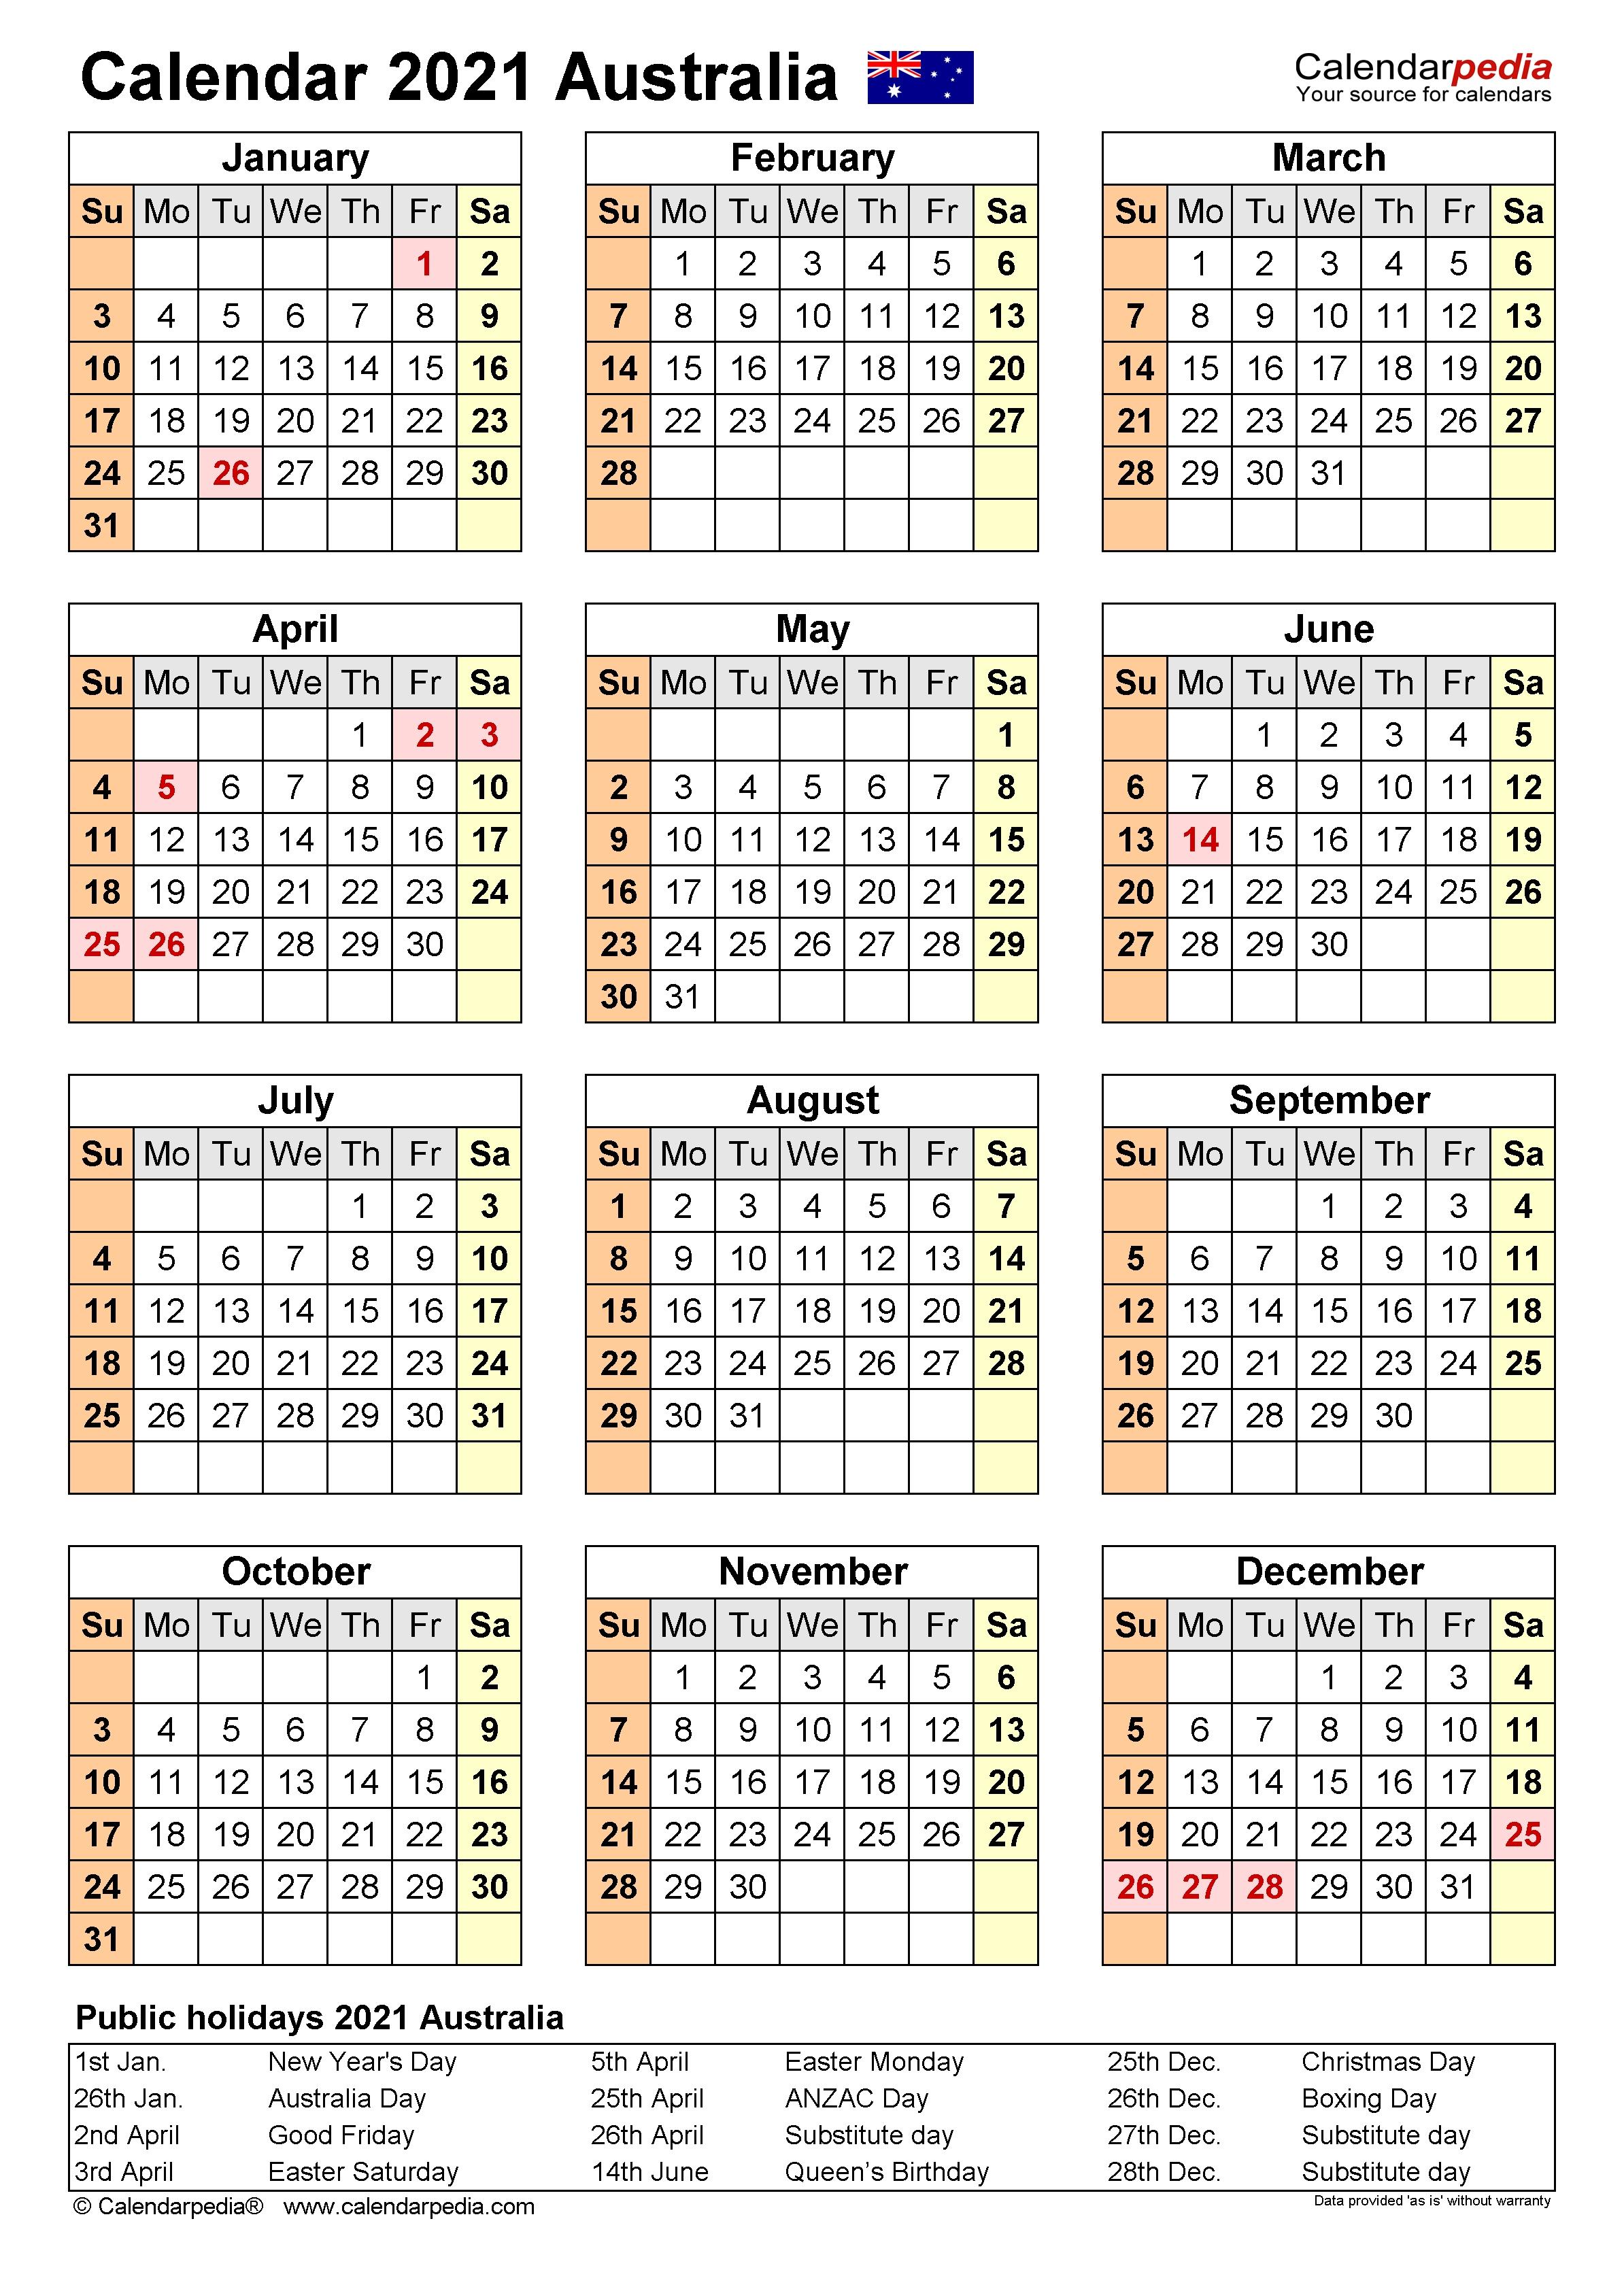 Australia Calendar 2021 - Free Printable Excel Templates  2021 Financial Year Calendar Australia